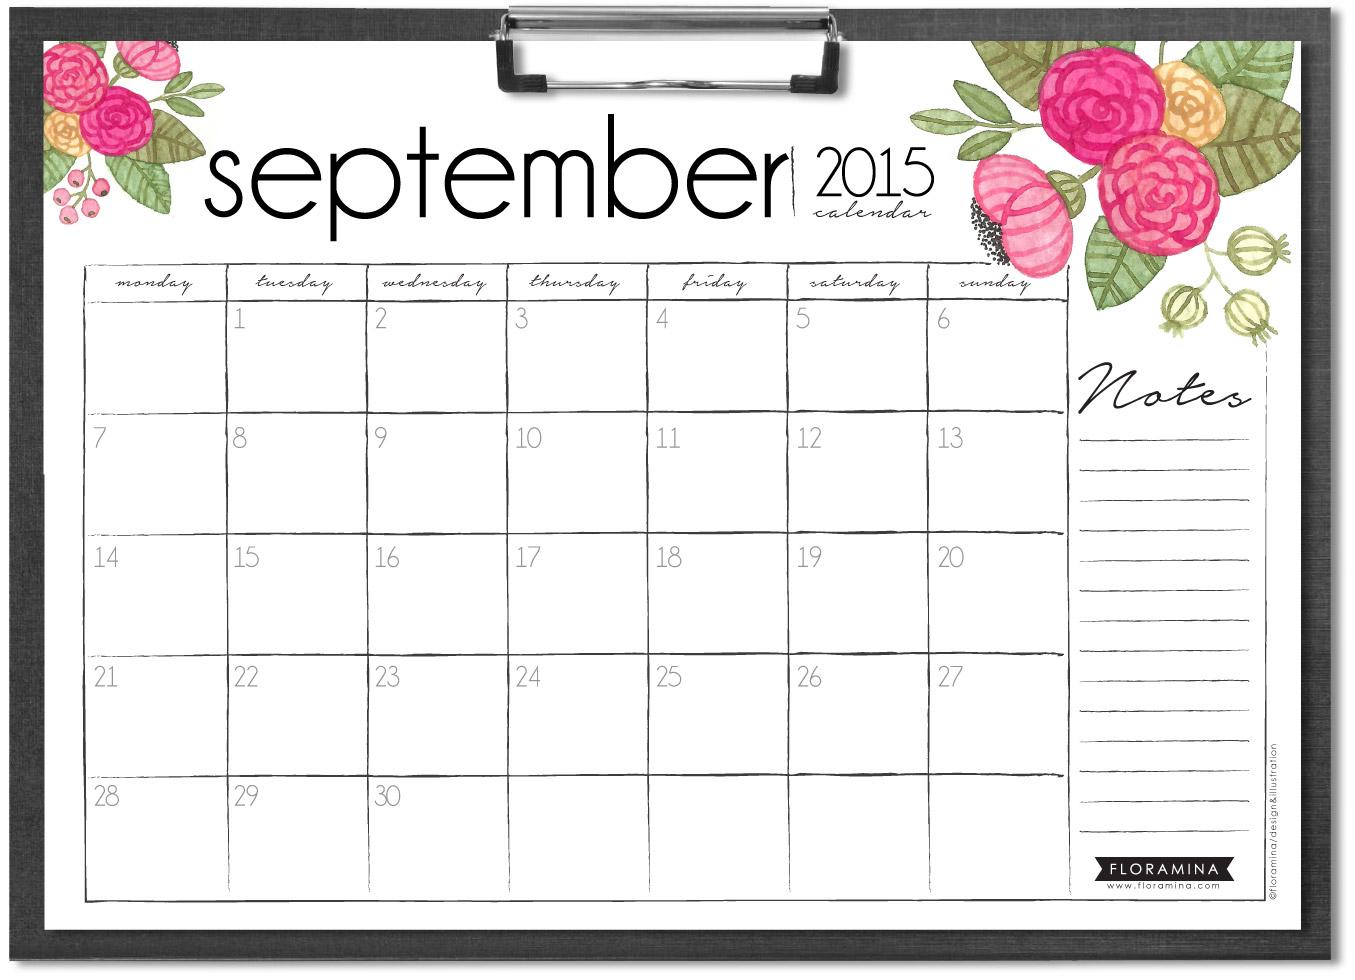 floramina september watercolor free month calendar